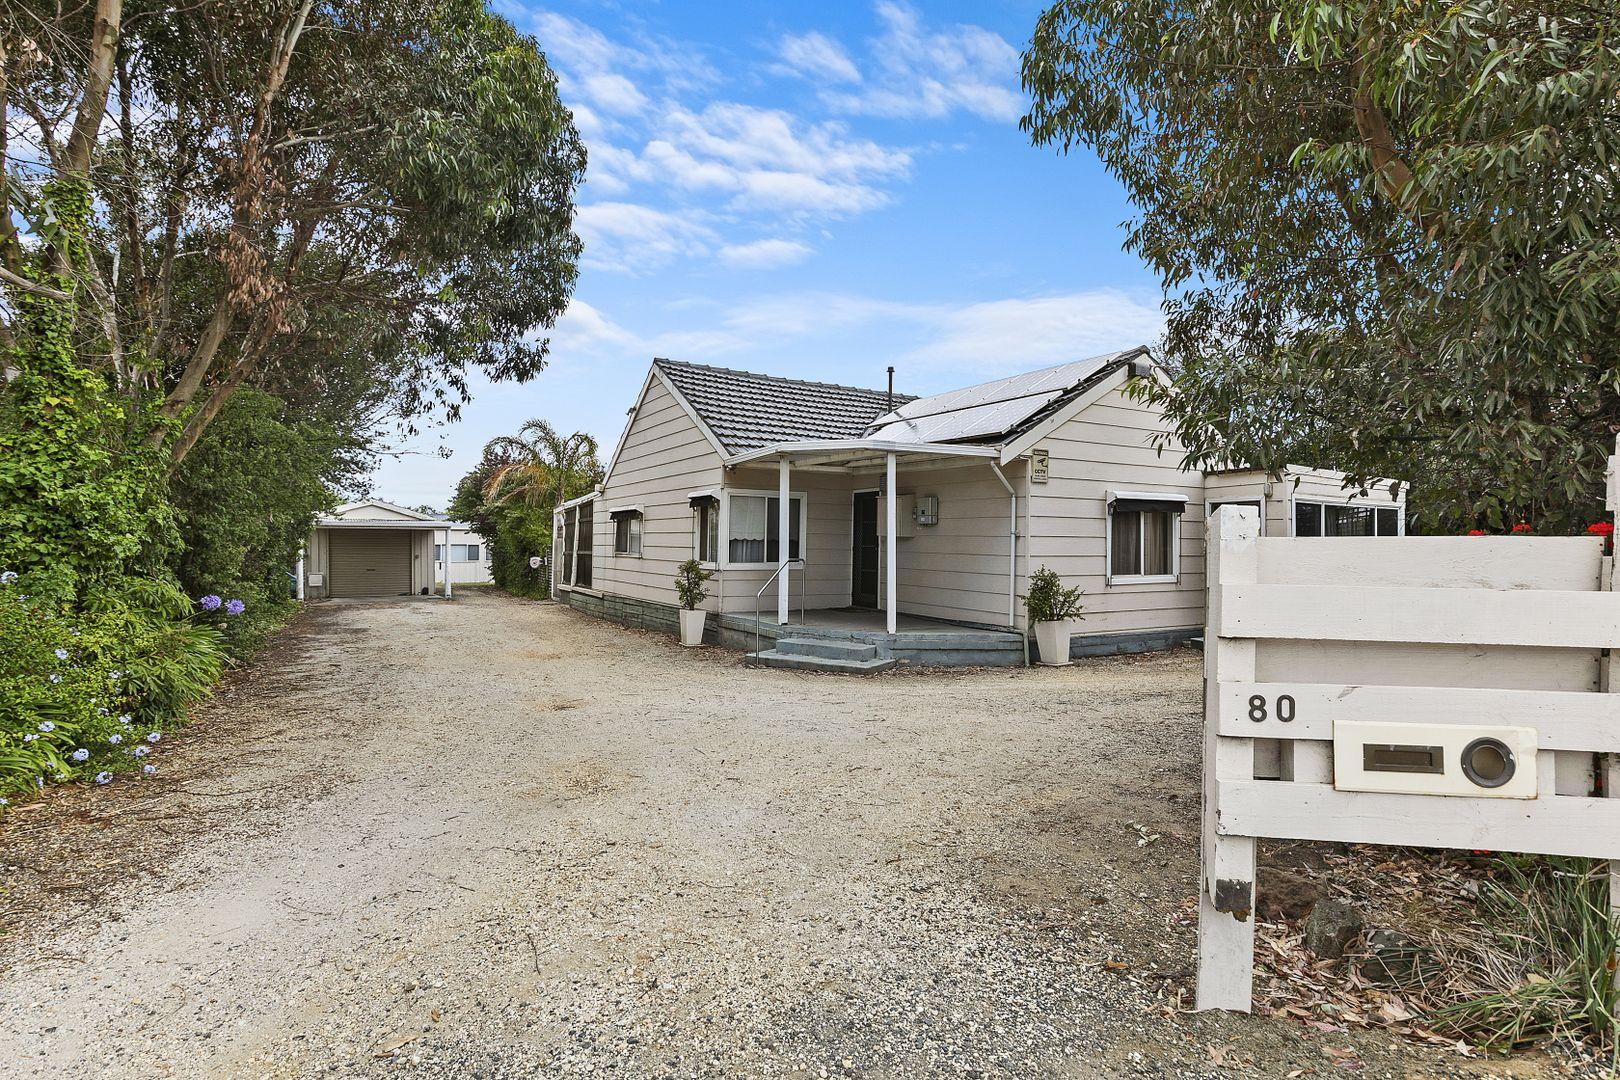 80 Geelong Road, Torquay VIC 3228, Image 1